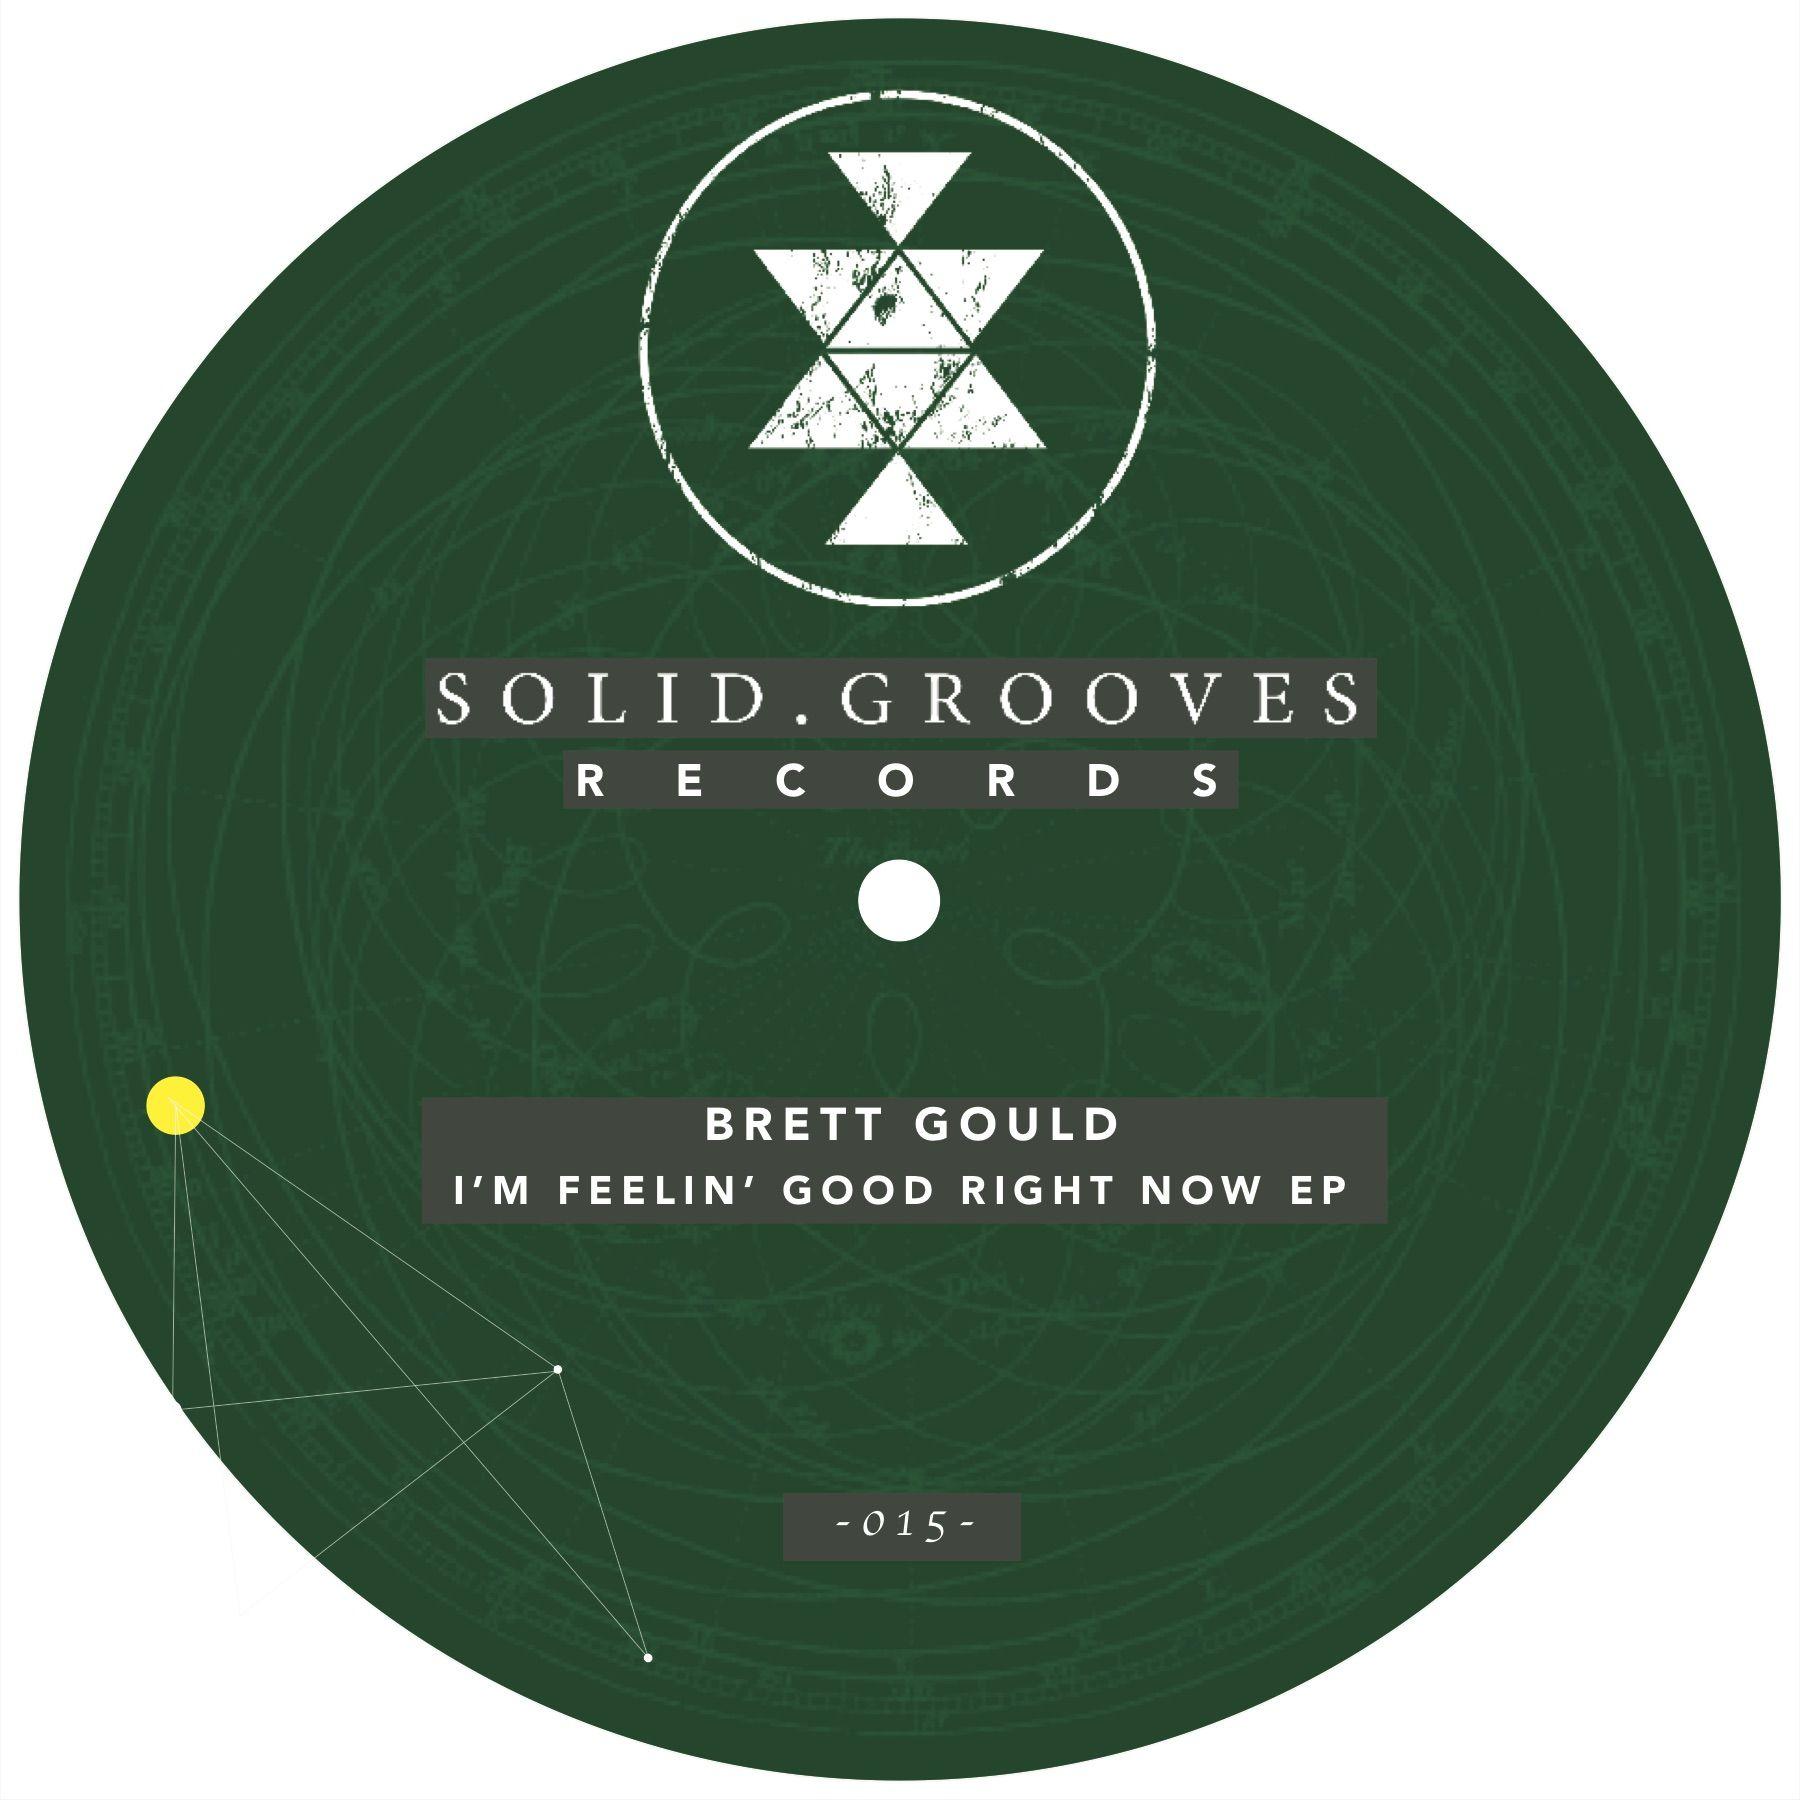 brett_gould_ep_solid_grooves_ep_cover.jpg